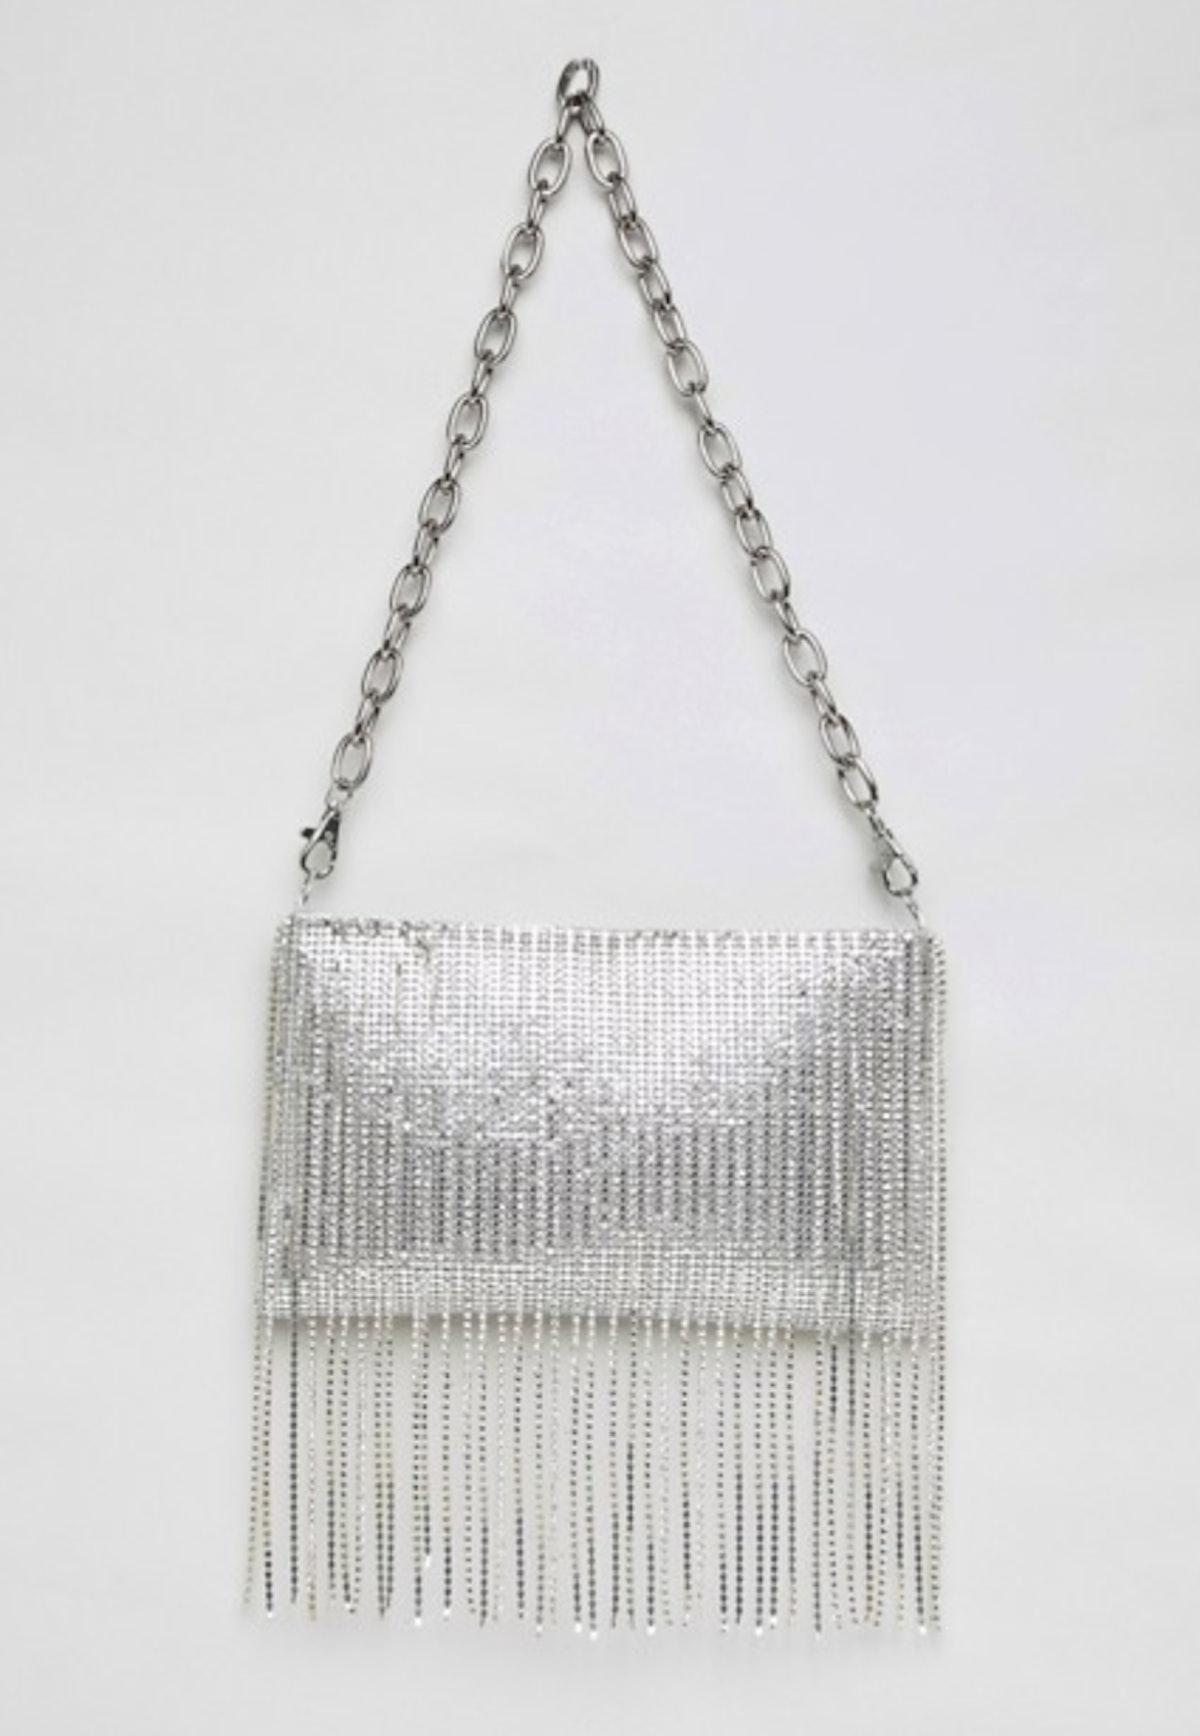 ASOS DESIGN 90s chainmail fringe clutch bag